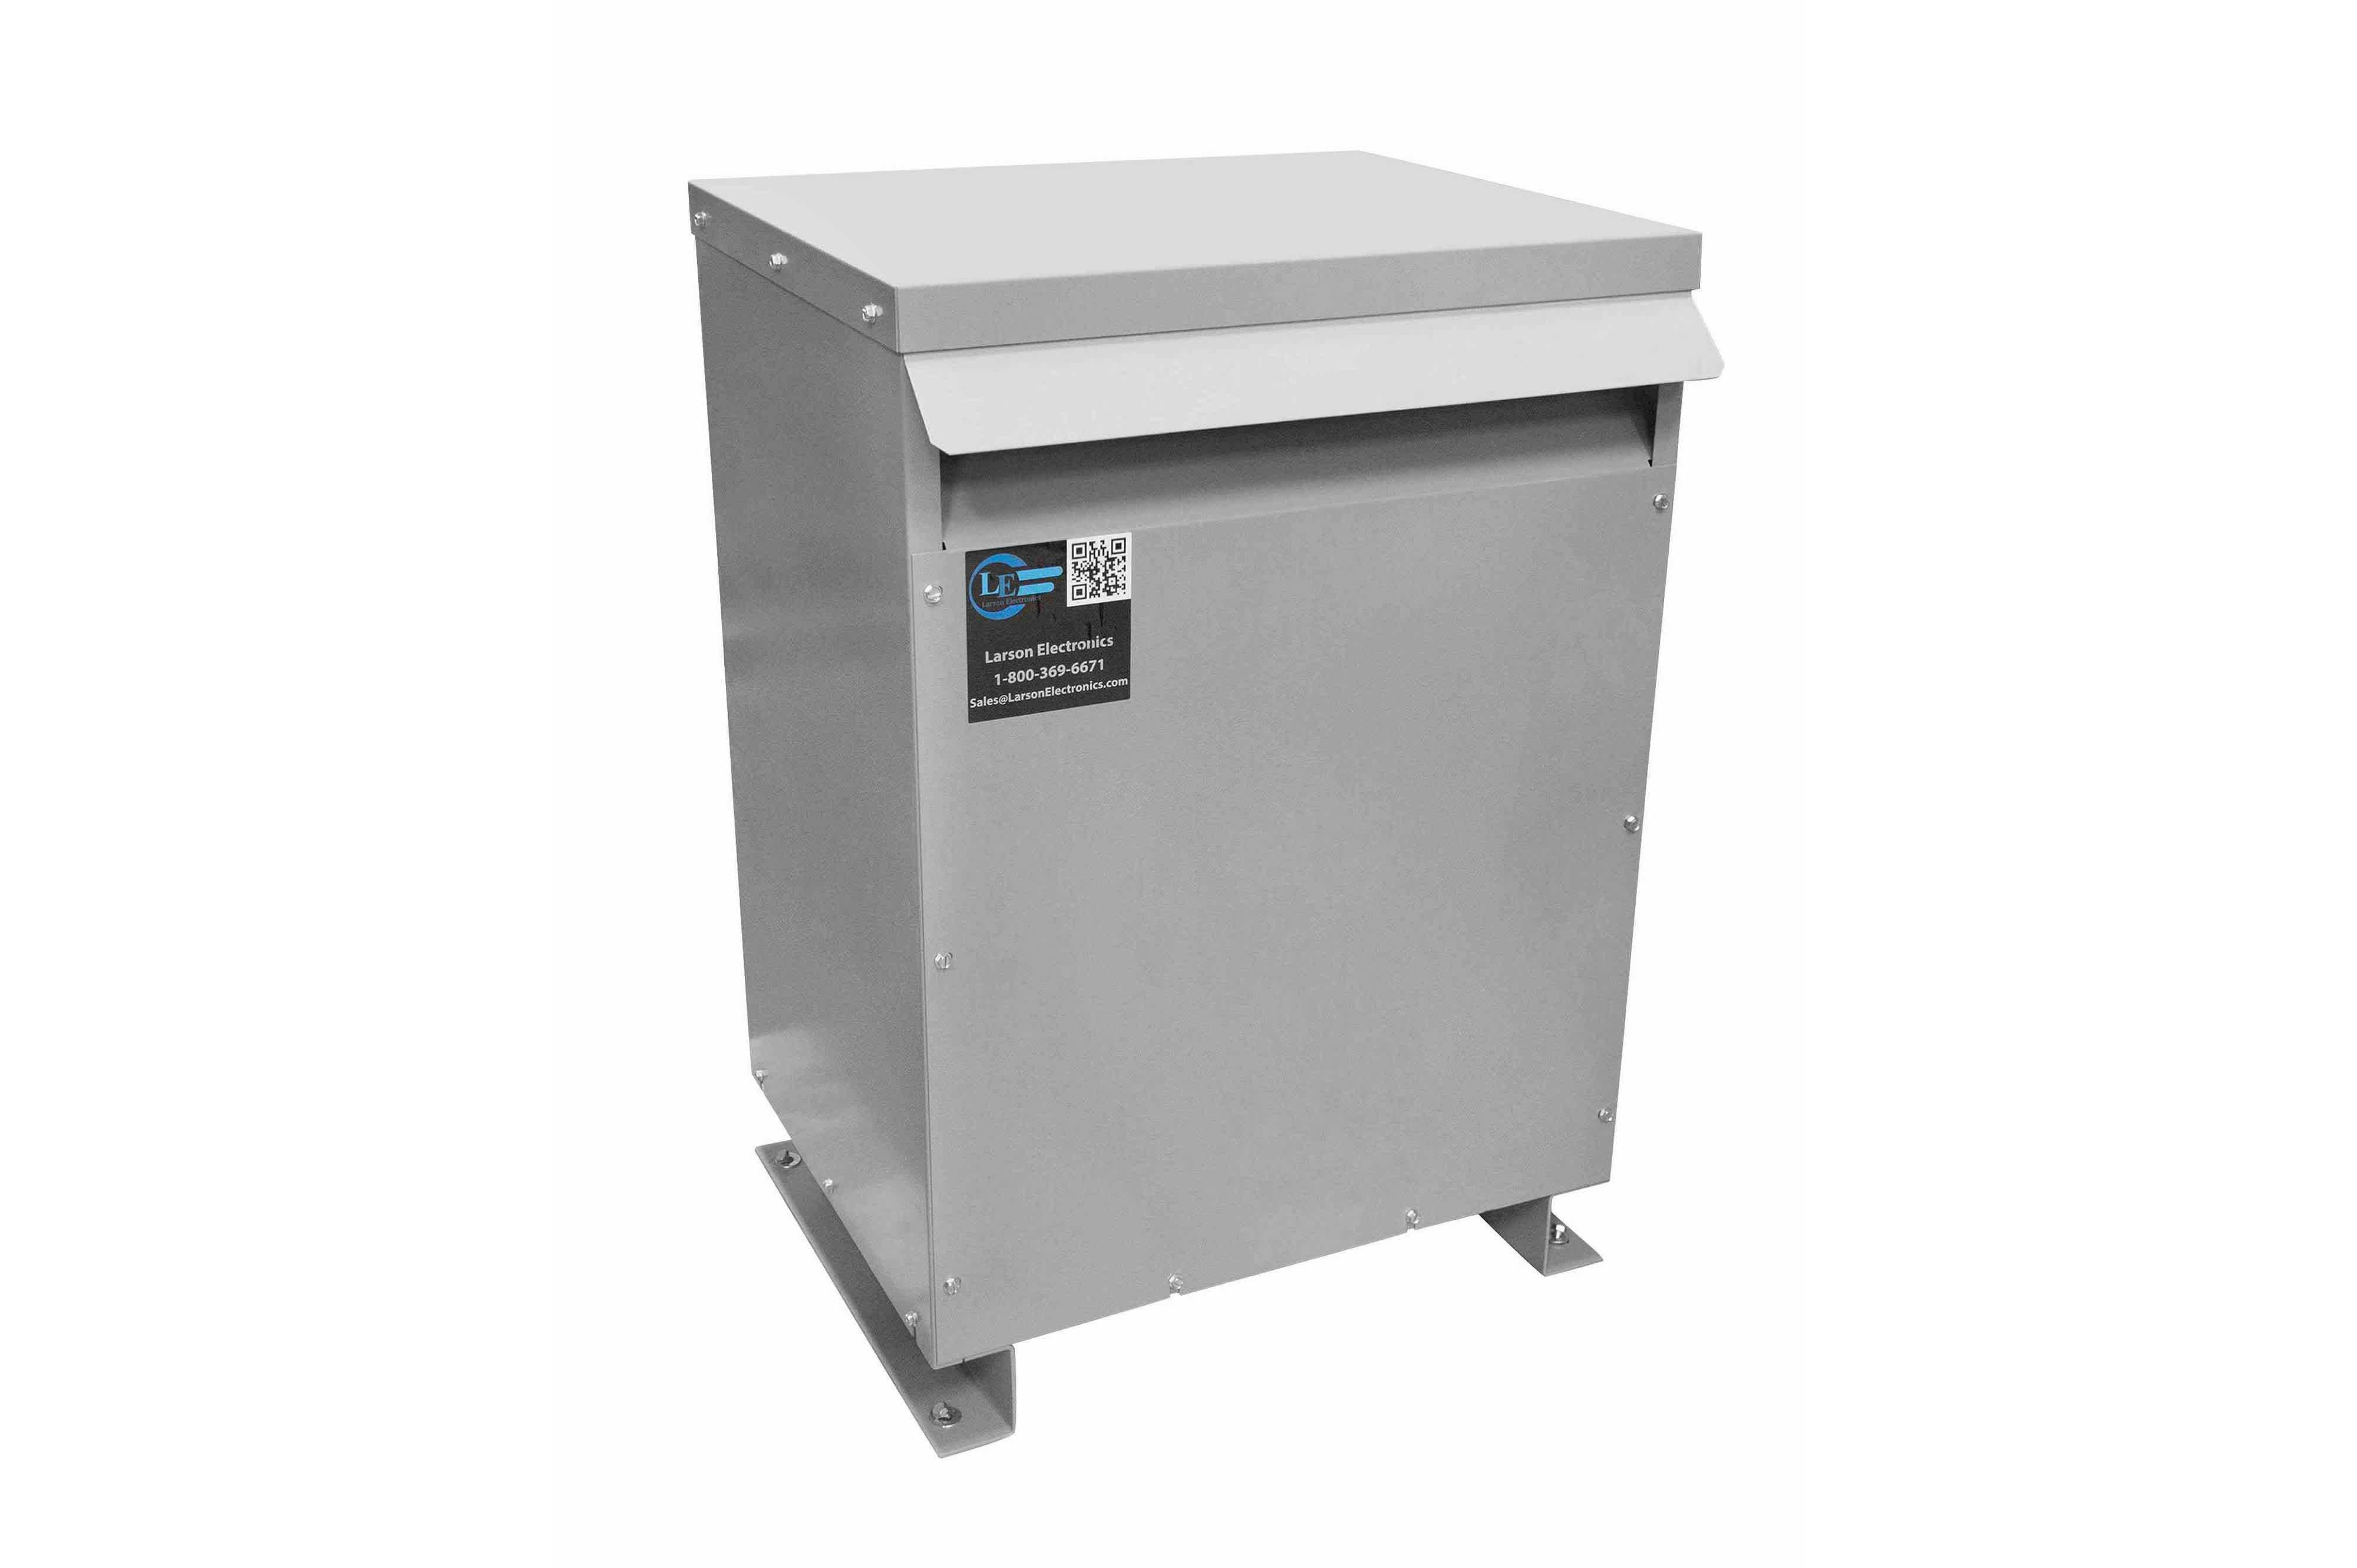 150 kVA 3PH Isolation Transformer, 400V Wye Primary, 480Y/277 Wye-N Secondary, N3R, Ventilated, 60 Hz